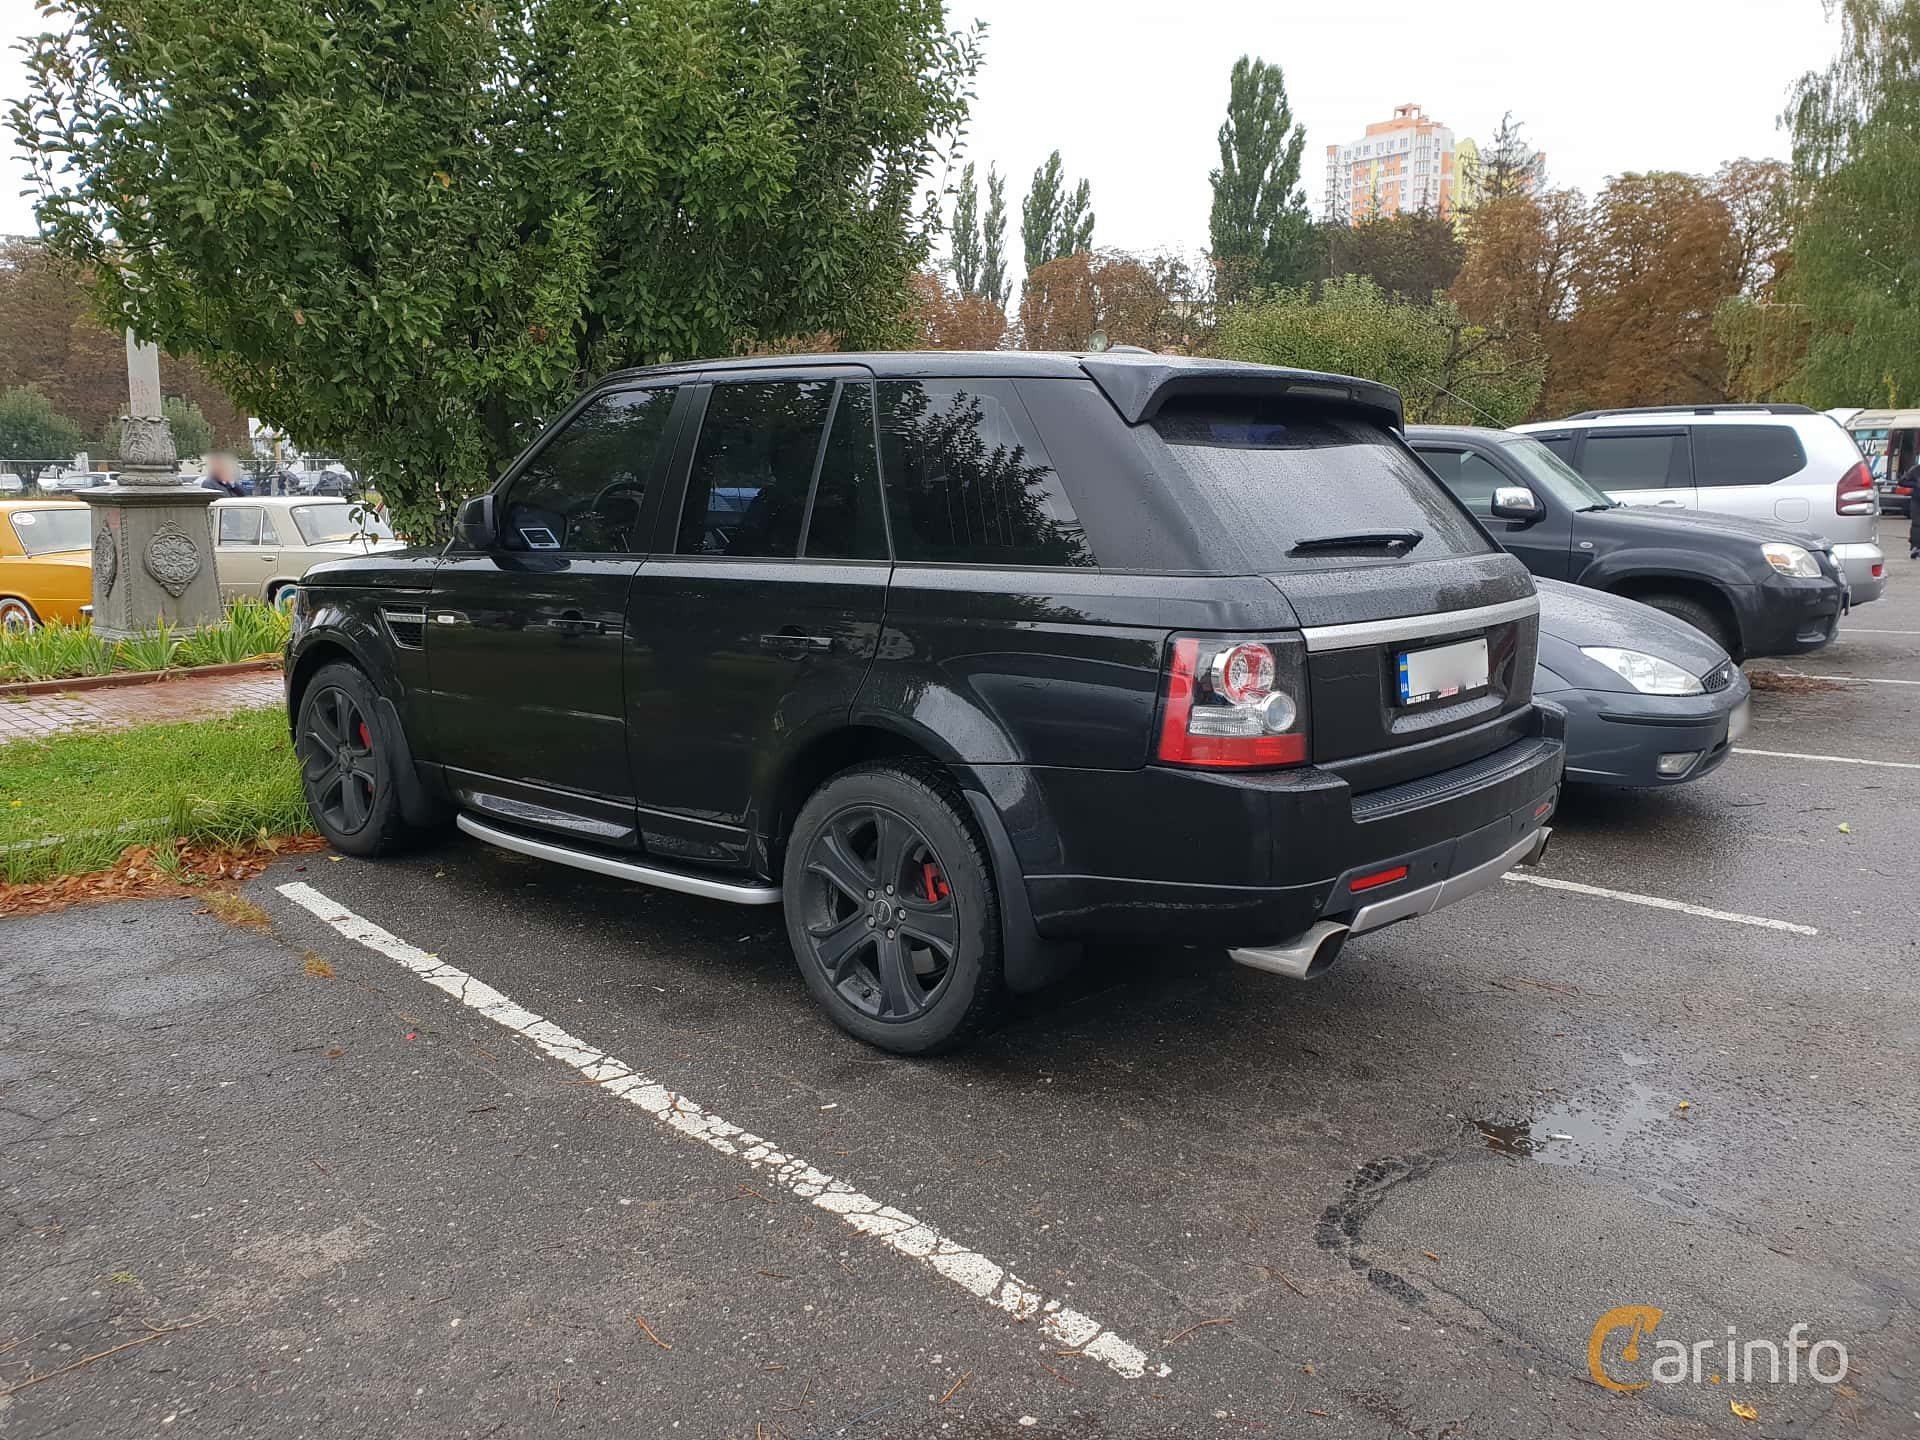 Land Rover Range Rover Sport 5.0 V8 4WD Automatic, 510hp, 2013 at Old Car Land no.2 2018